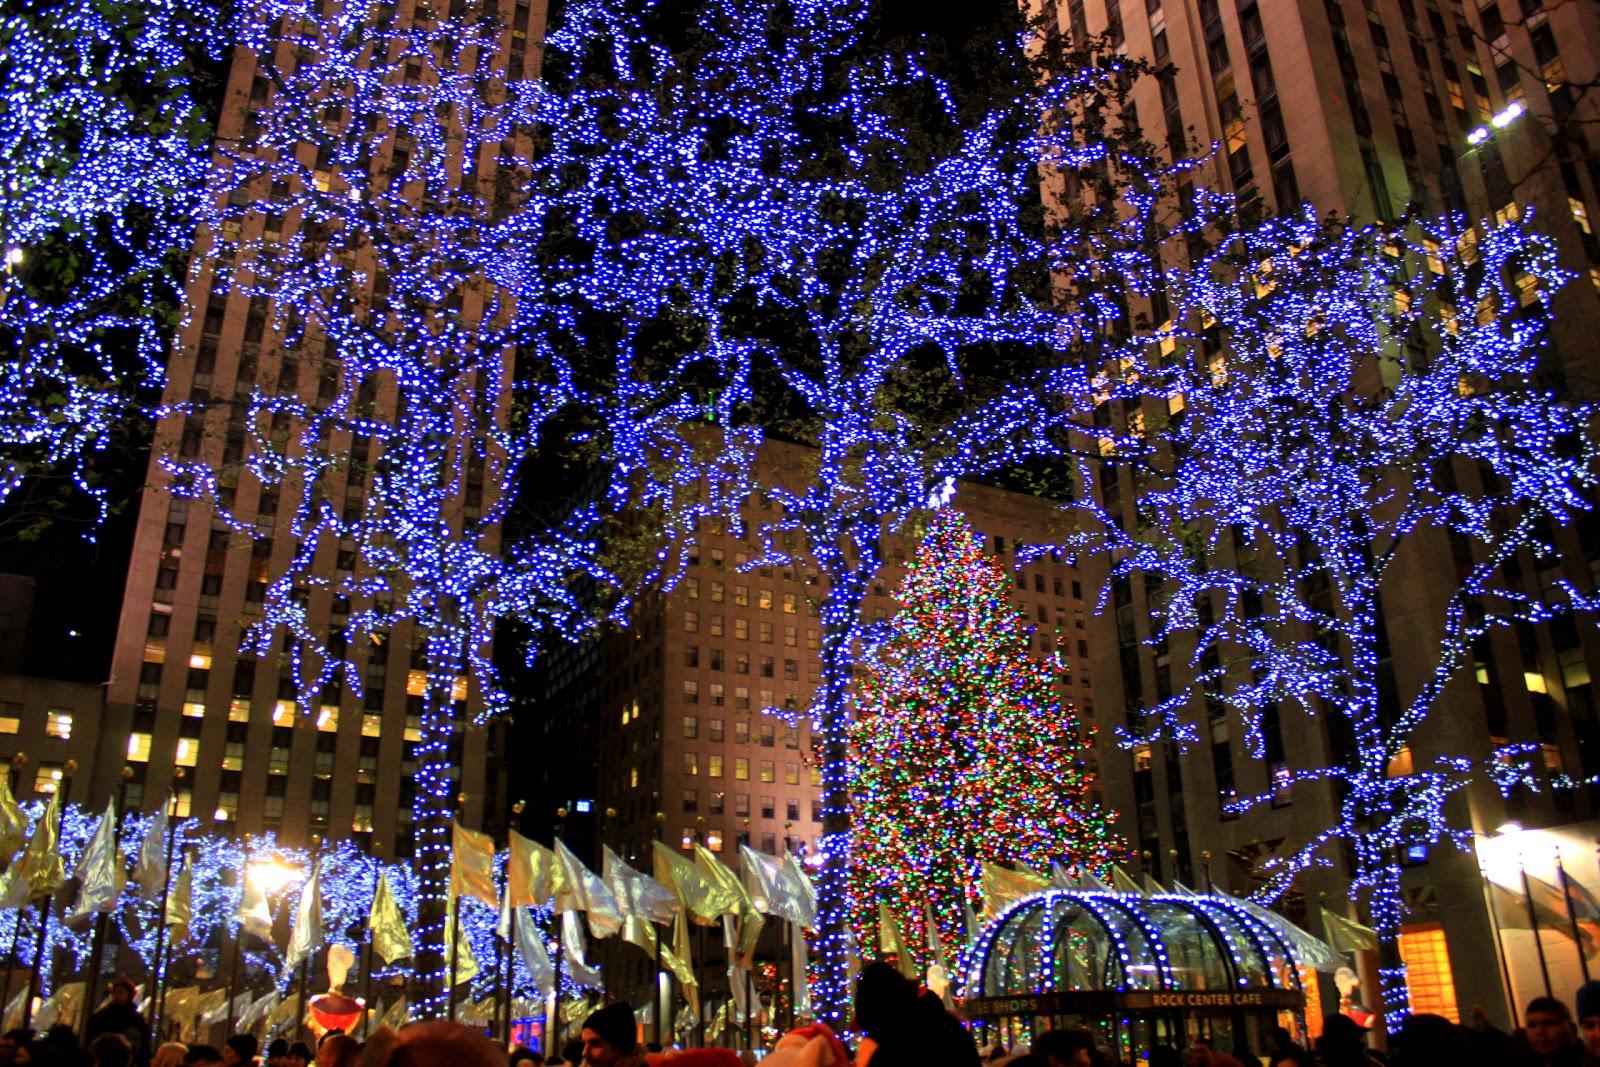 Lilly Pulitzer Fall Wallpaper Doo Dah Christmas In New York